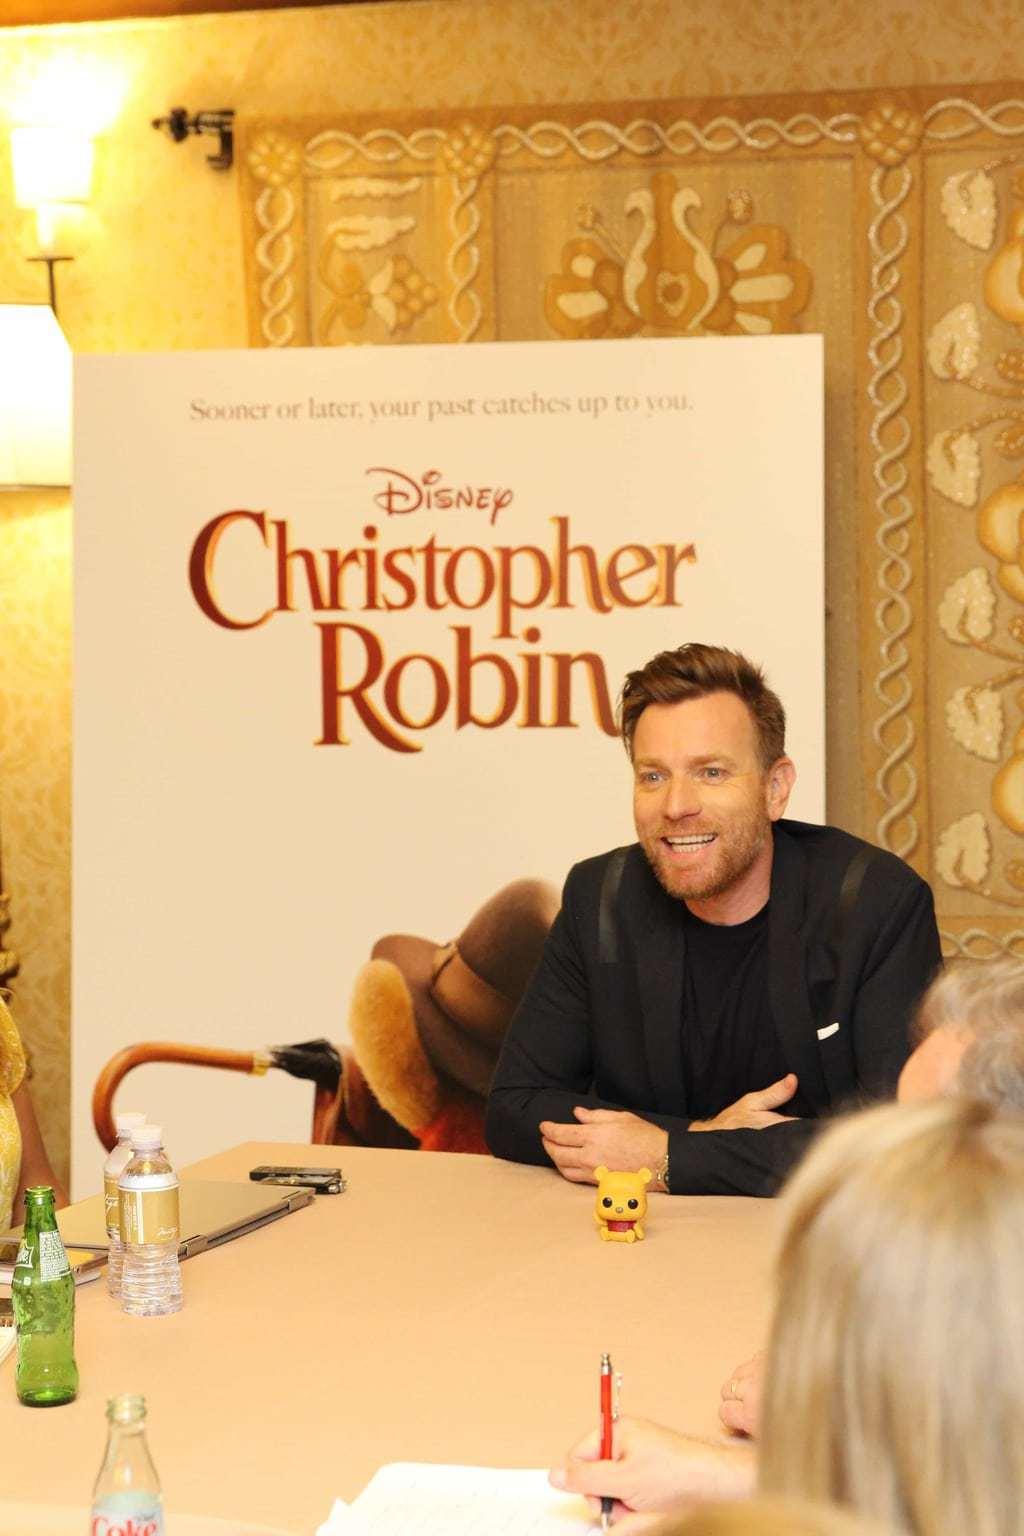 Interview With Ewan McGregor, Ewan McGregor Interview, Disney's Christopher Robin movie, Ewan McGregor as Christopher Robin